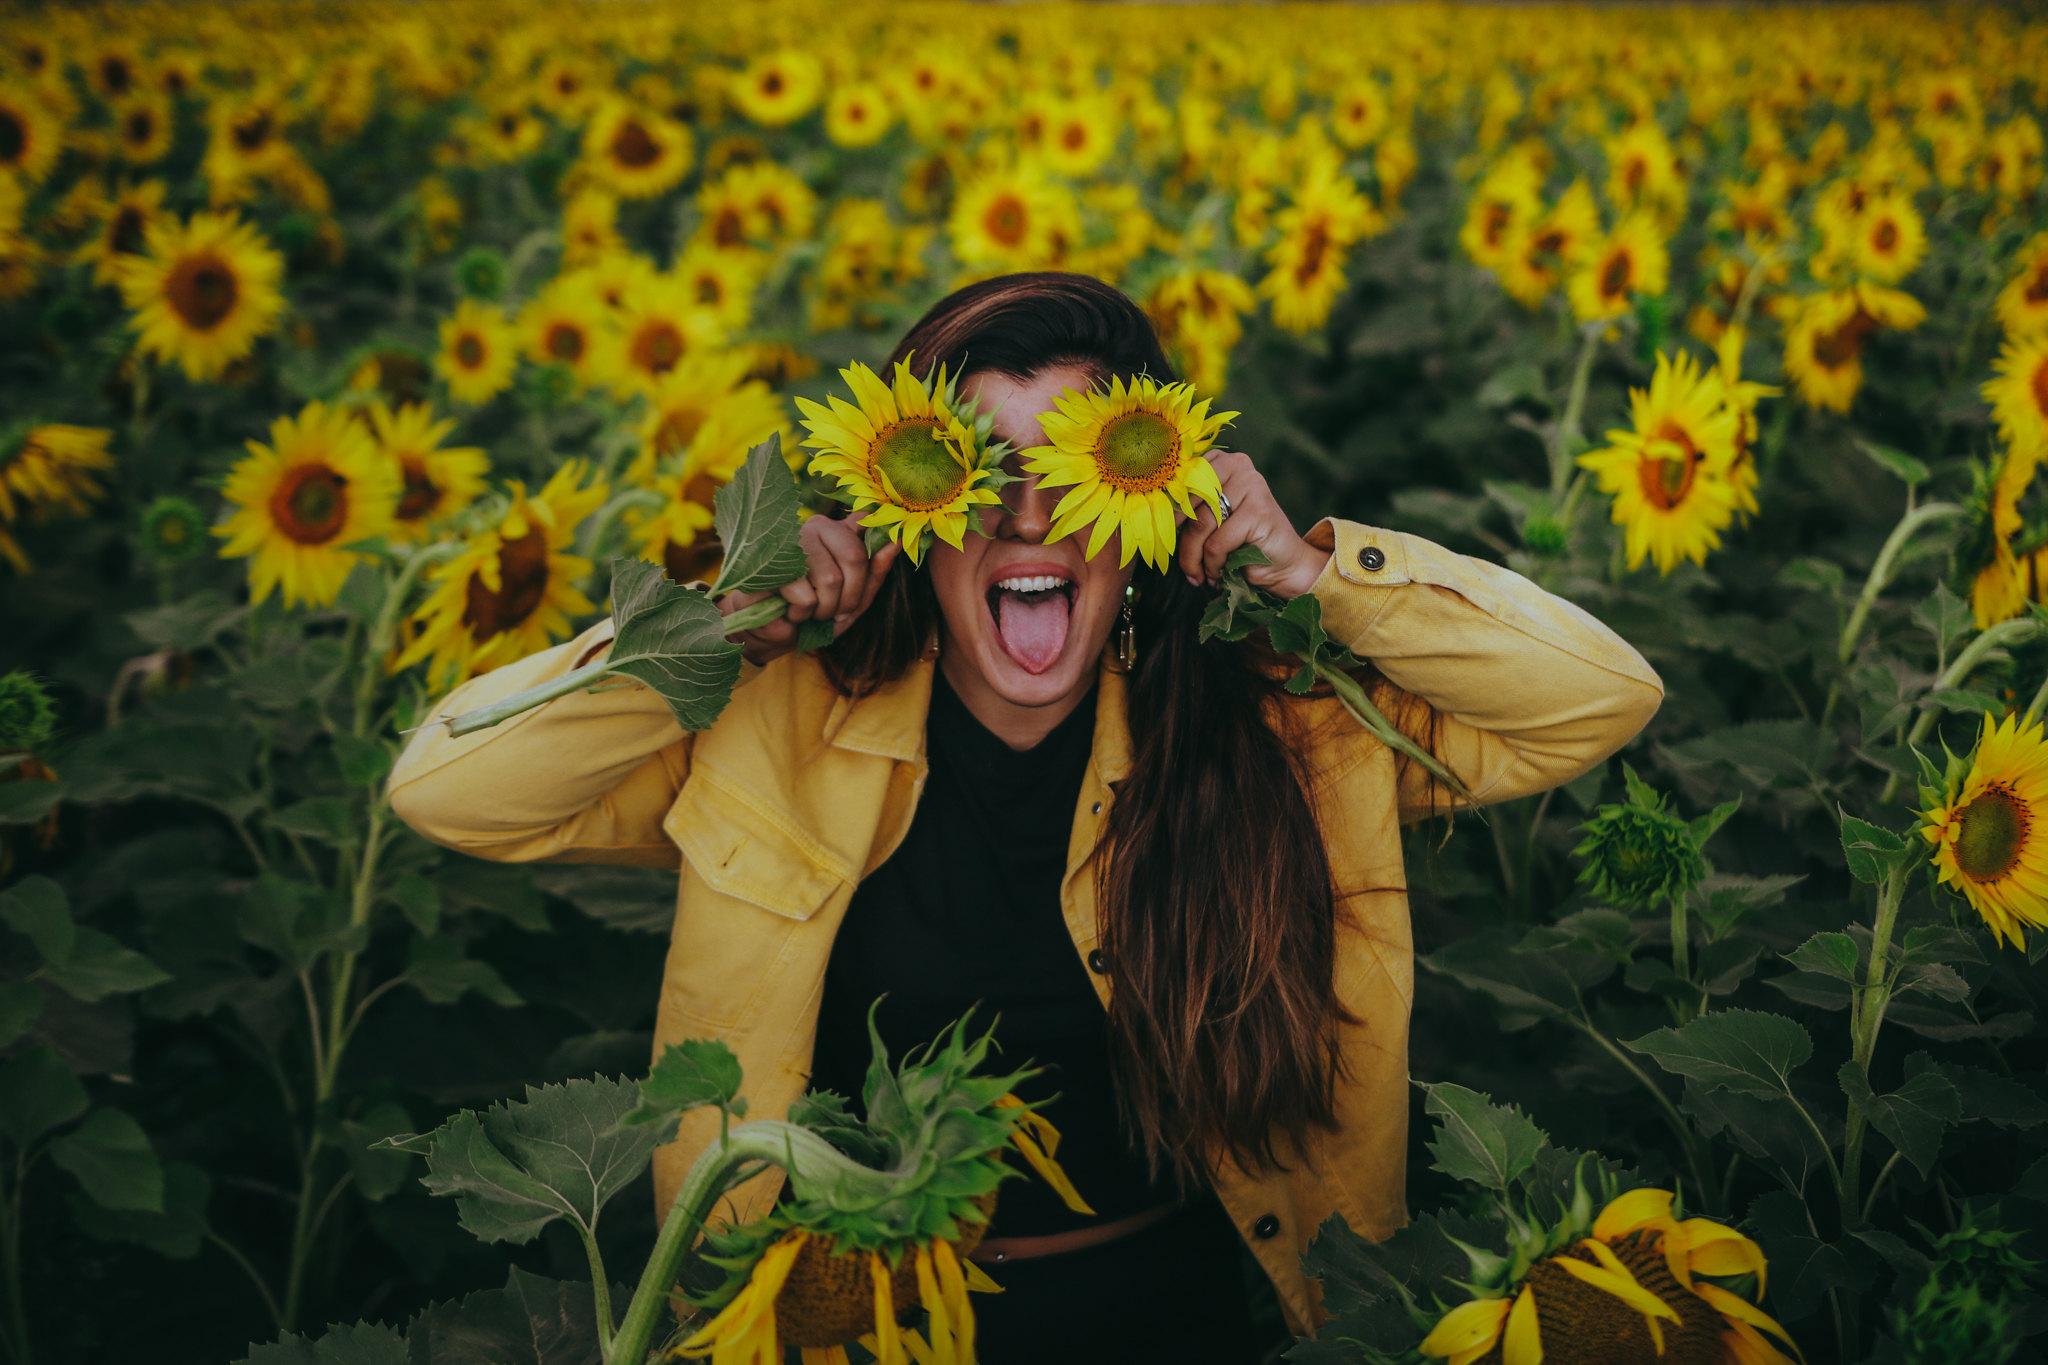 auringonkukkia-27